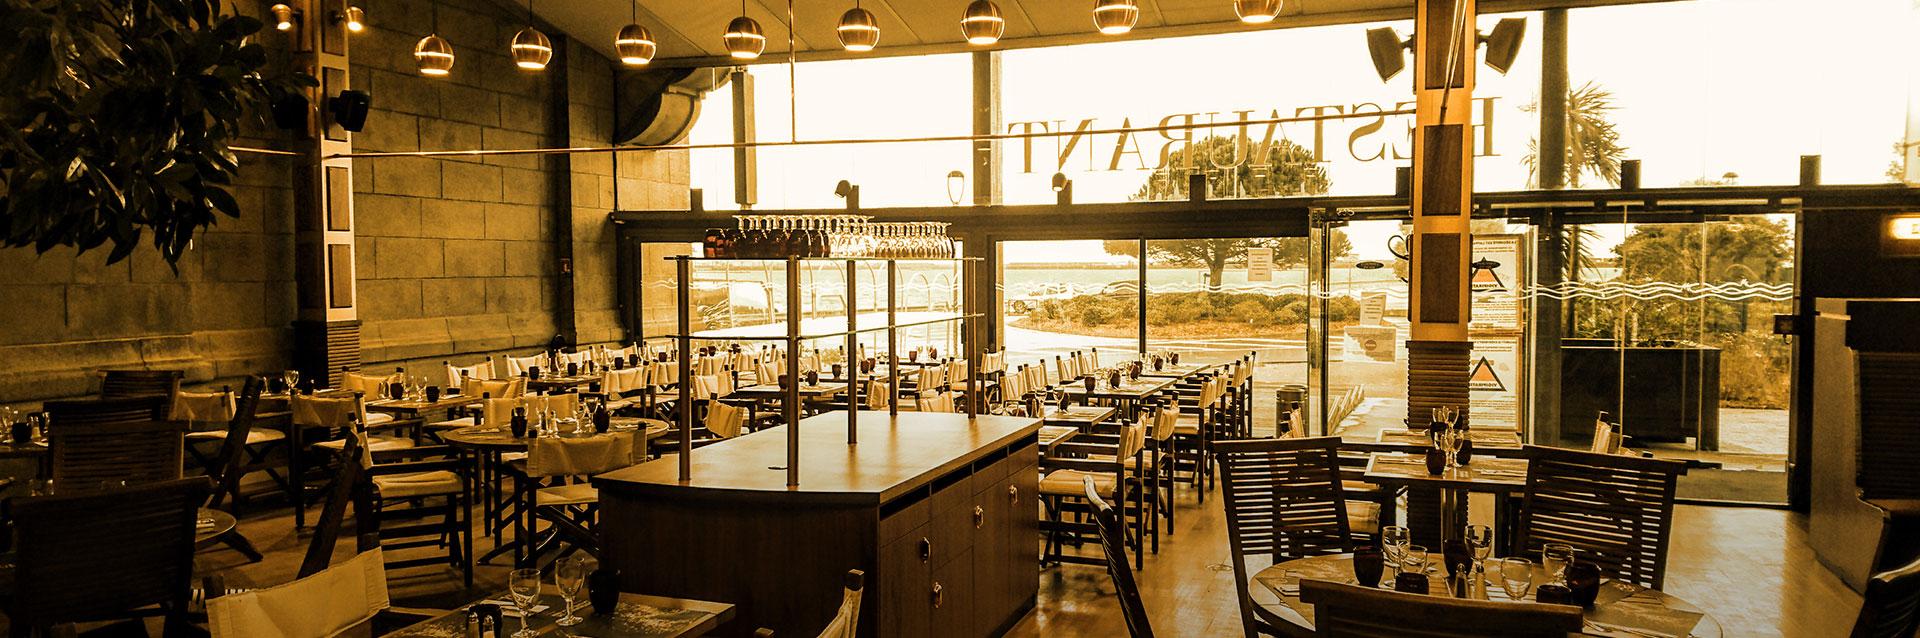 Restaurant-Le-Quai-des-Mers-2018-Sepia